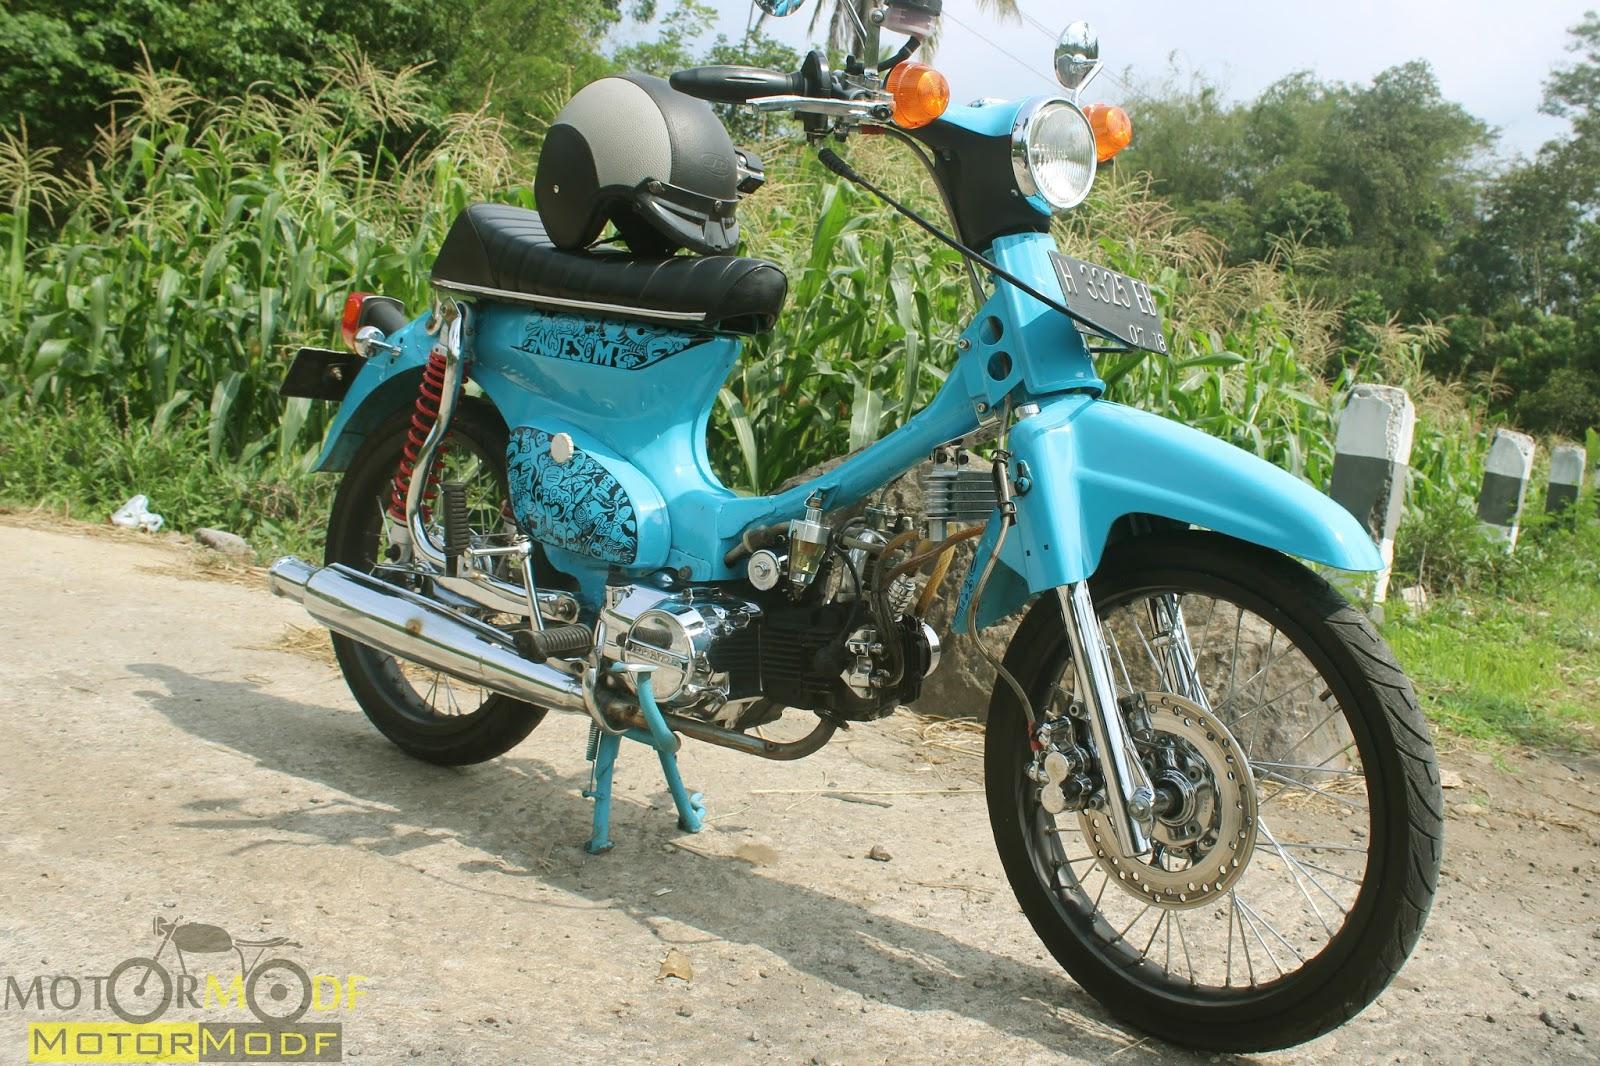 Modifikasi Jap Style C70  Modifikasi Motor Japstyle Terbaru